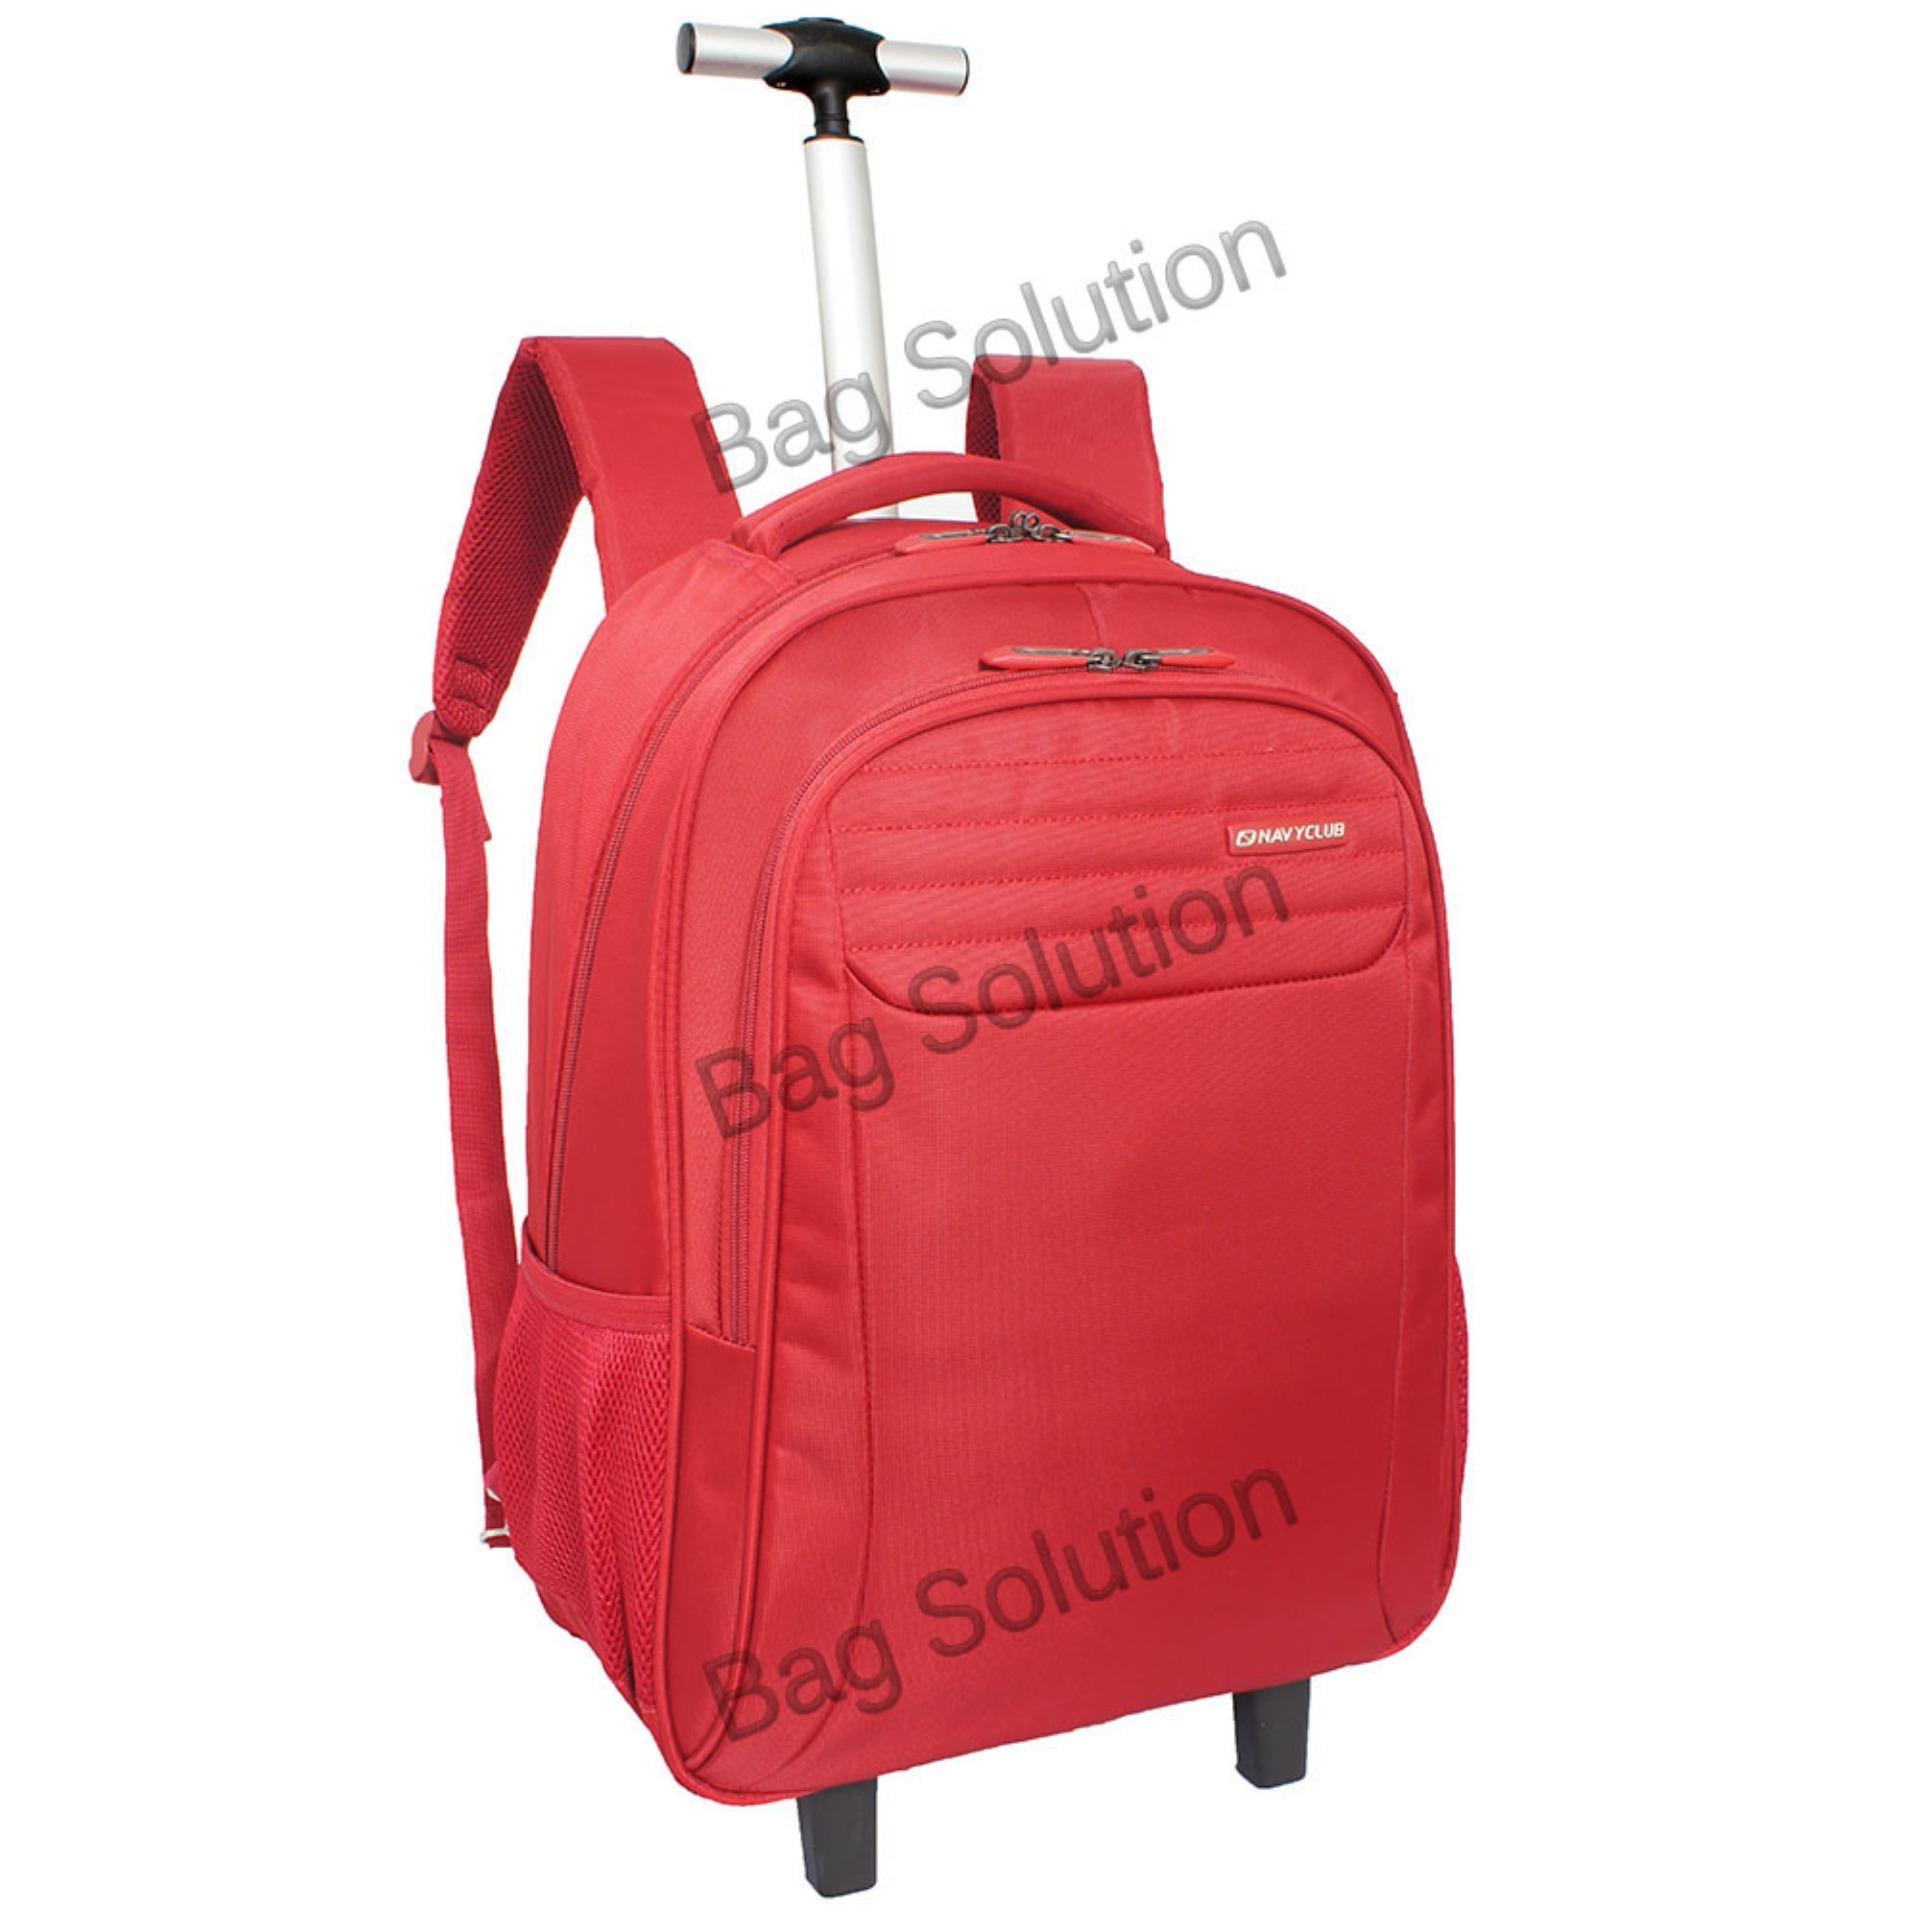 Jual Navy Club New Arrival Tas Laptop Backpack Ransel Trolley Travel Tahan Air Tas Pria Tas Wanita Tr 39 Merah Dki Jakarta